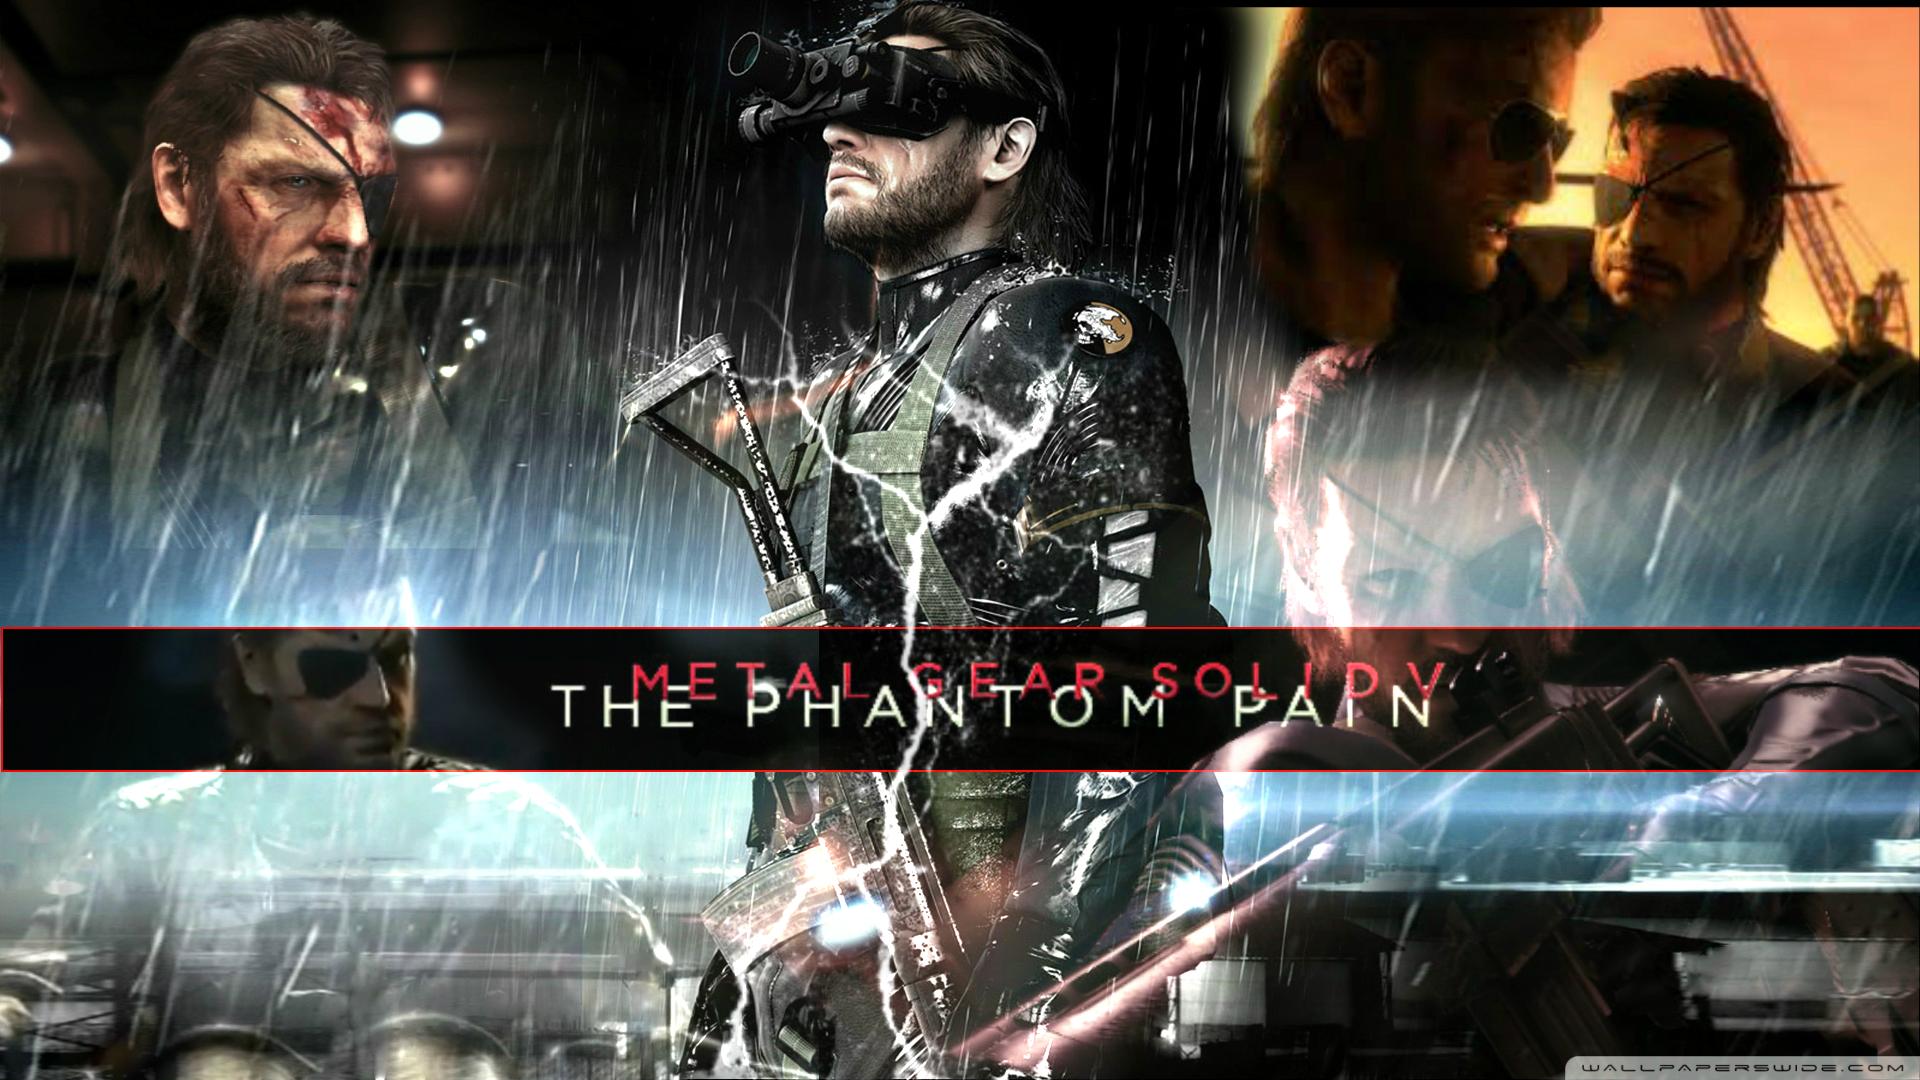 Free Download Metal Gear Solid V Wallpaper Rain 1920x1080 For